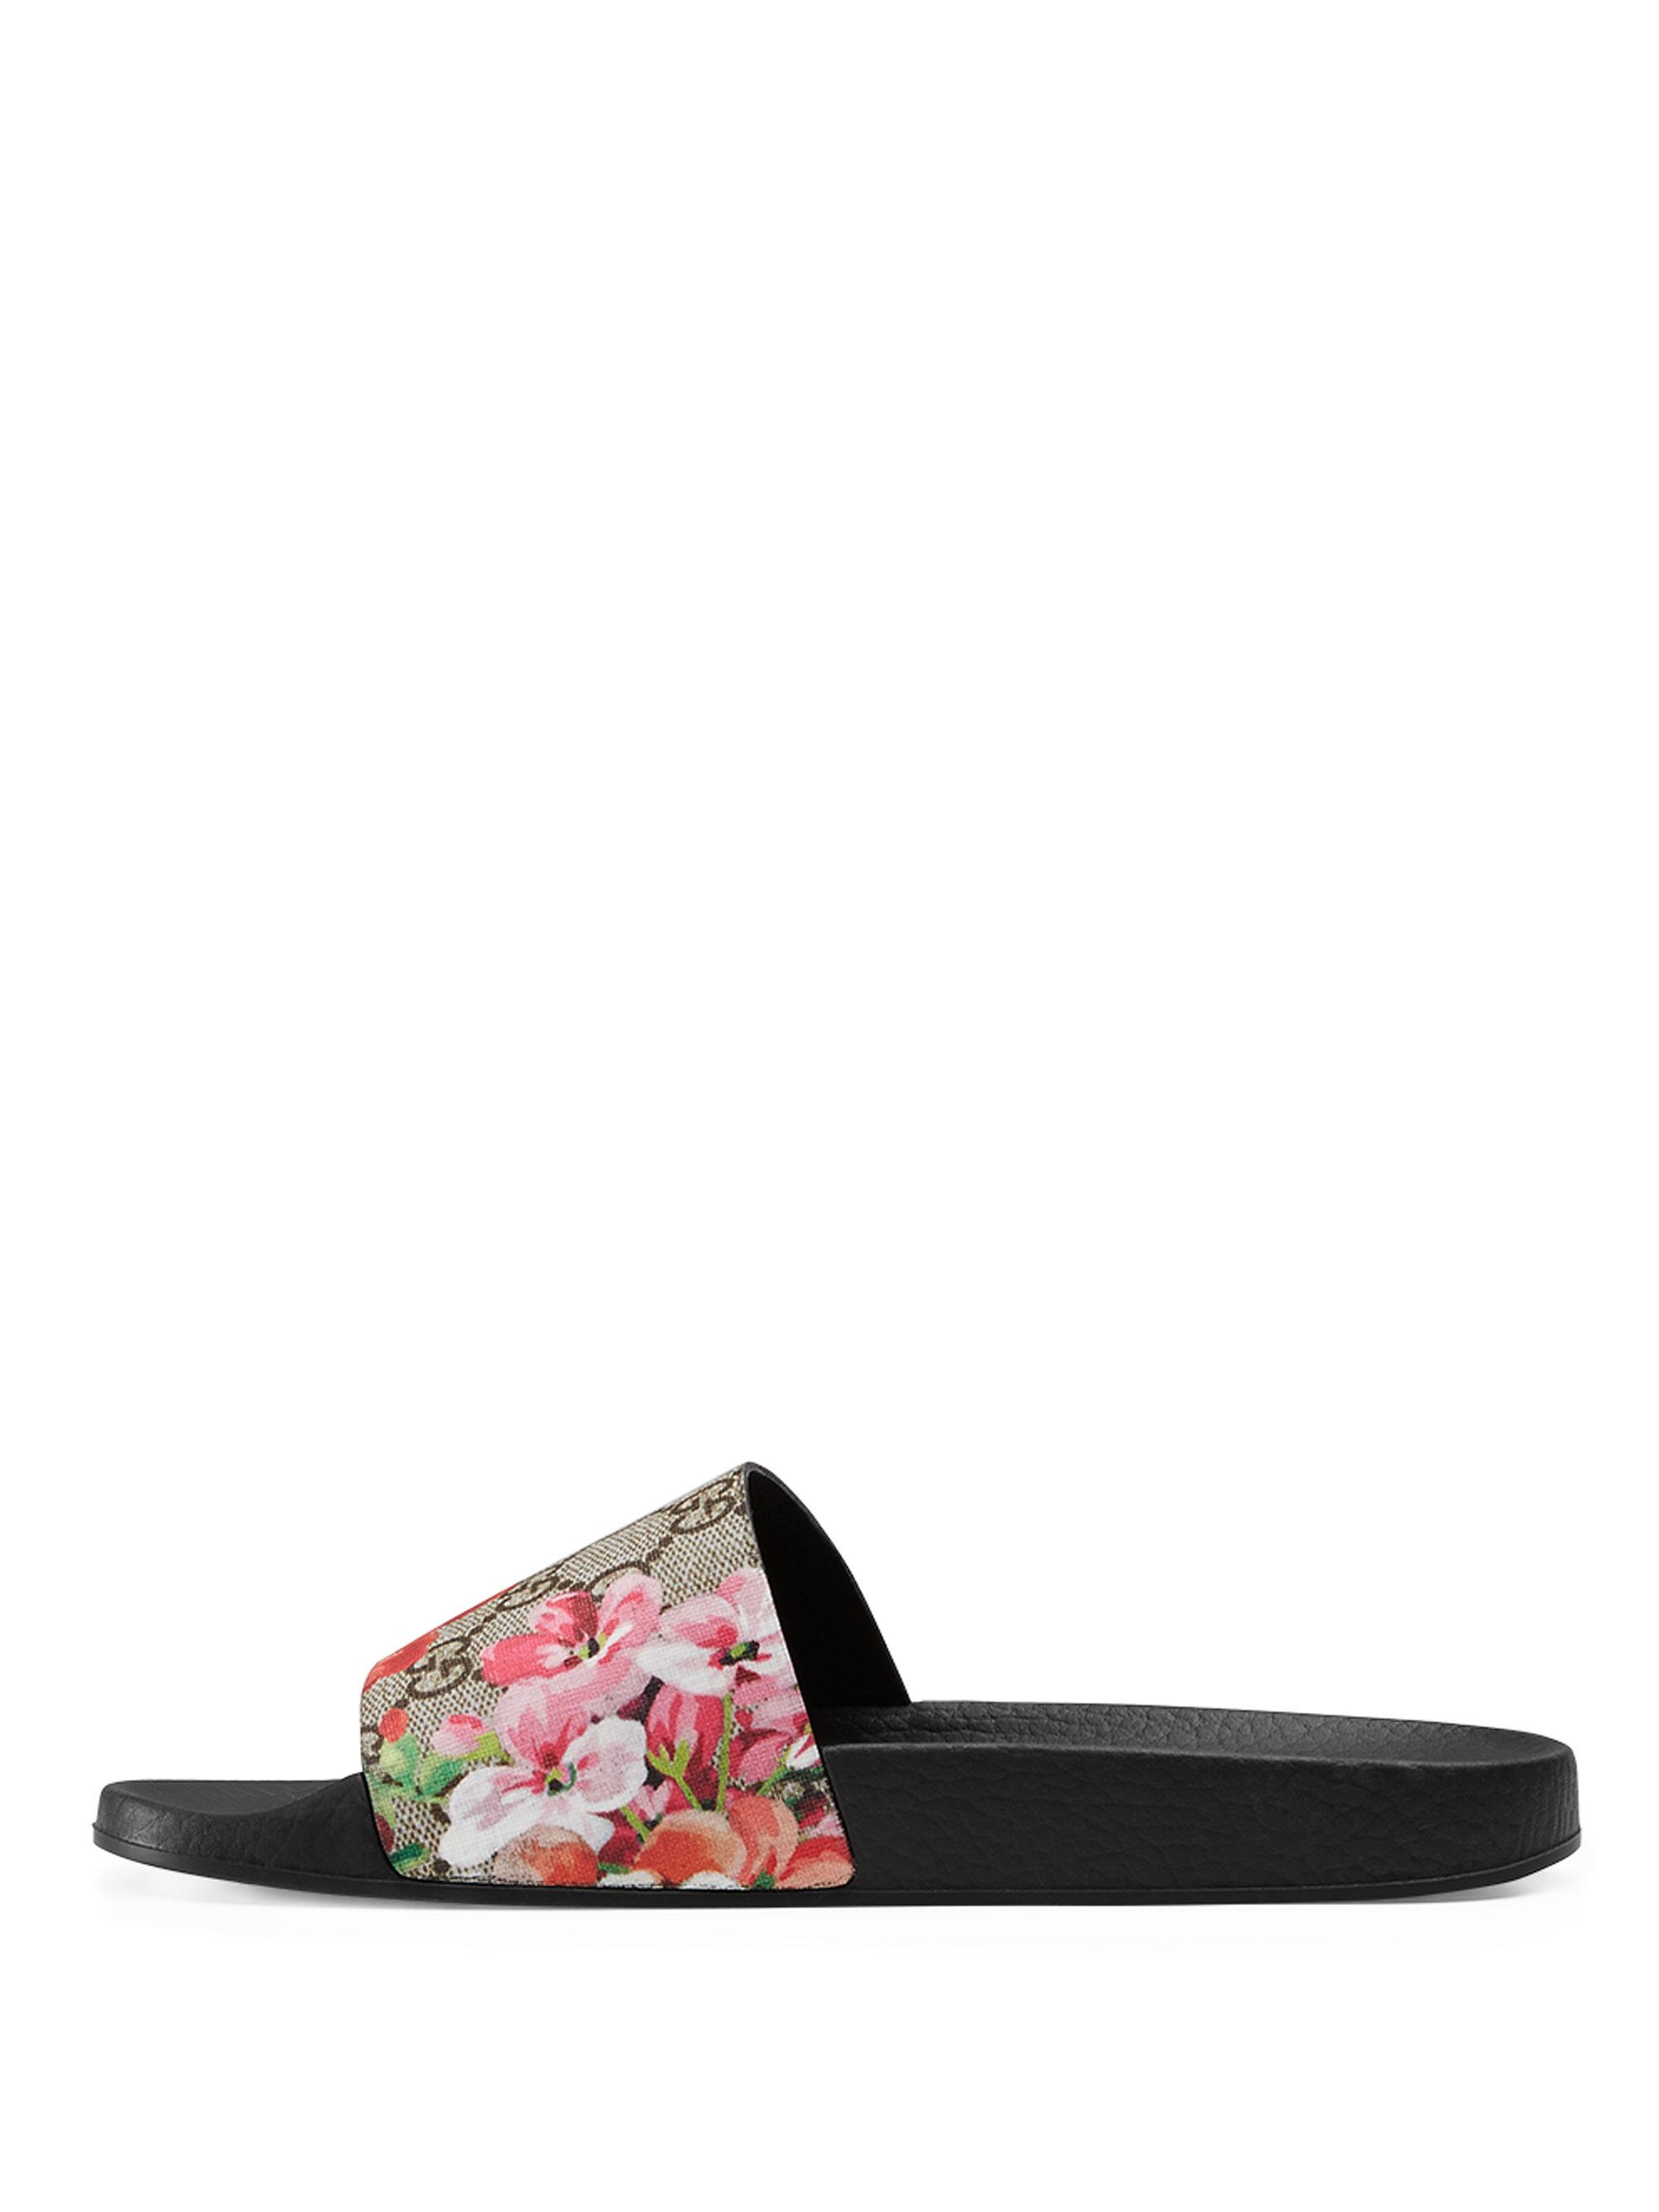 Gucci Pursuit Bloom Canvas Slide Sandals In Multicolor